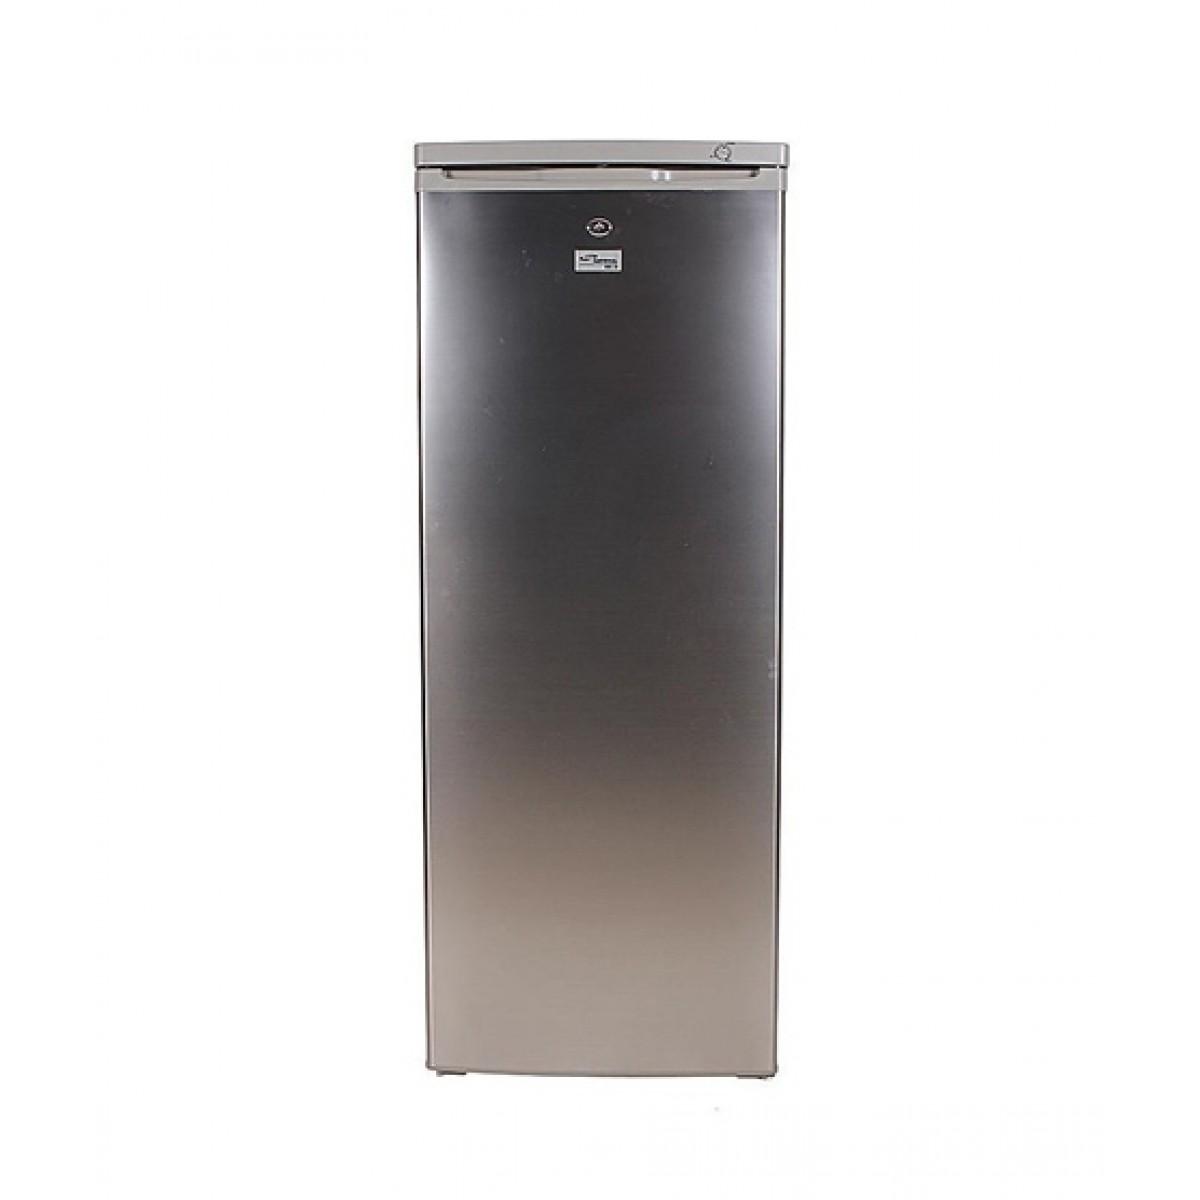 Gaba National Upright D-Frost Freezer (GF-150 DC)